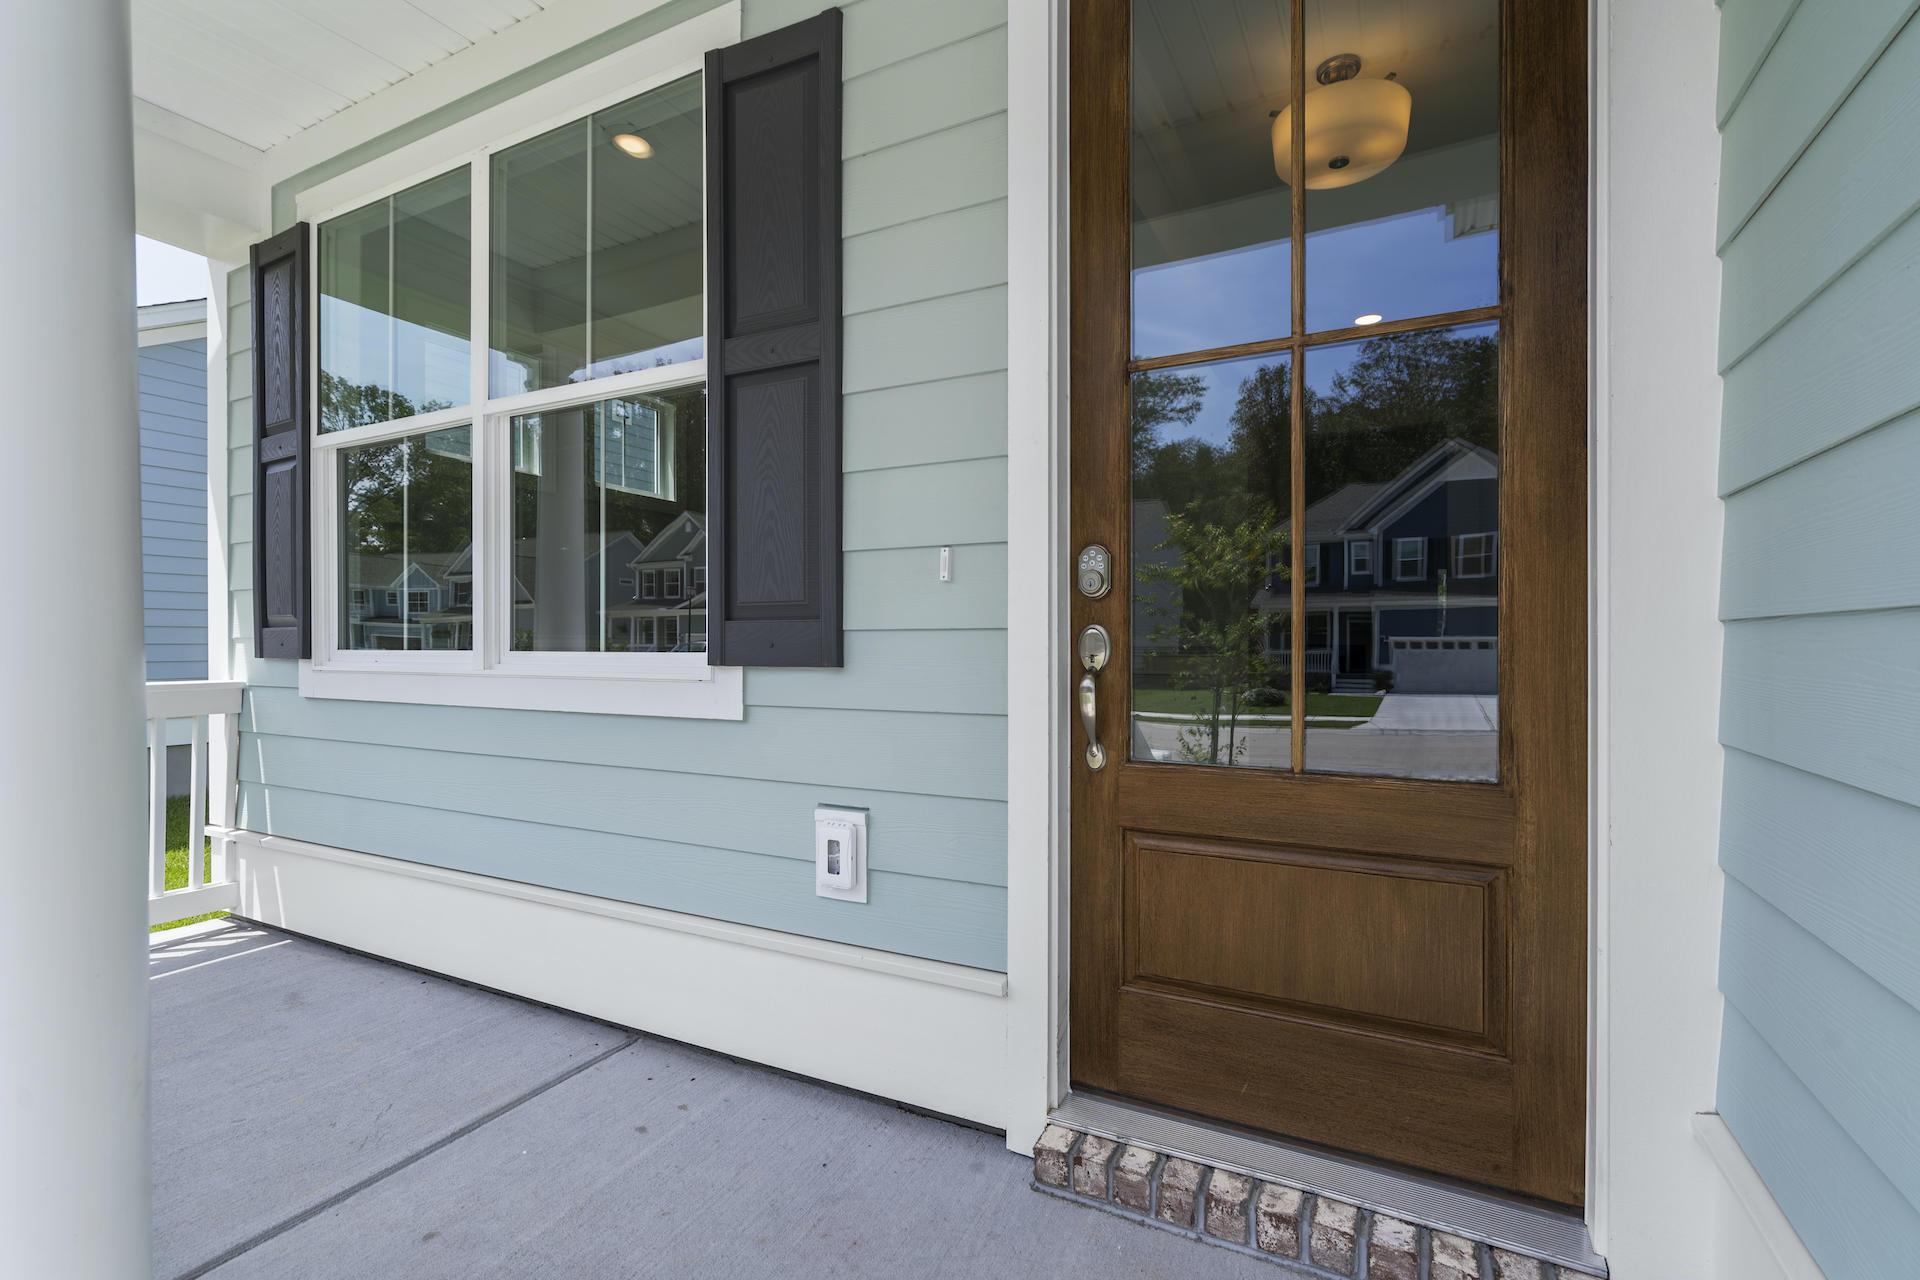 Drayton Oaks Homes For Sale - 105 Plowden Mill, Summerville, SC - 28